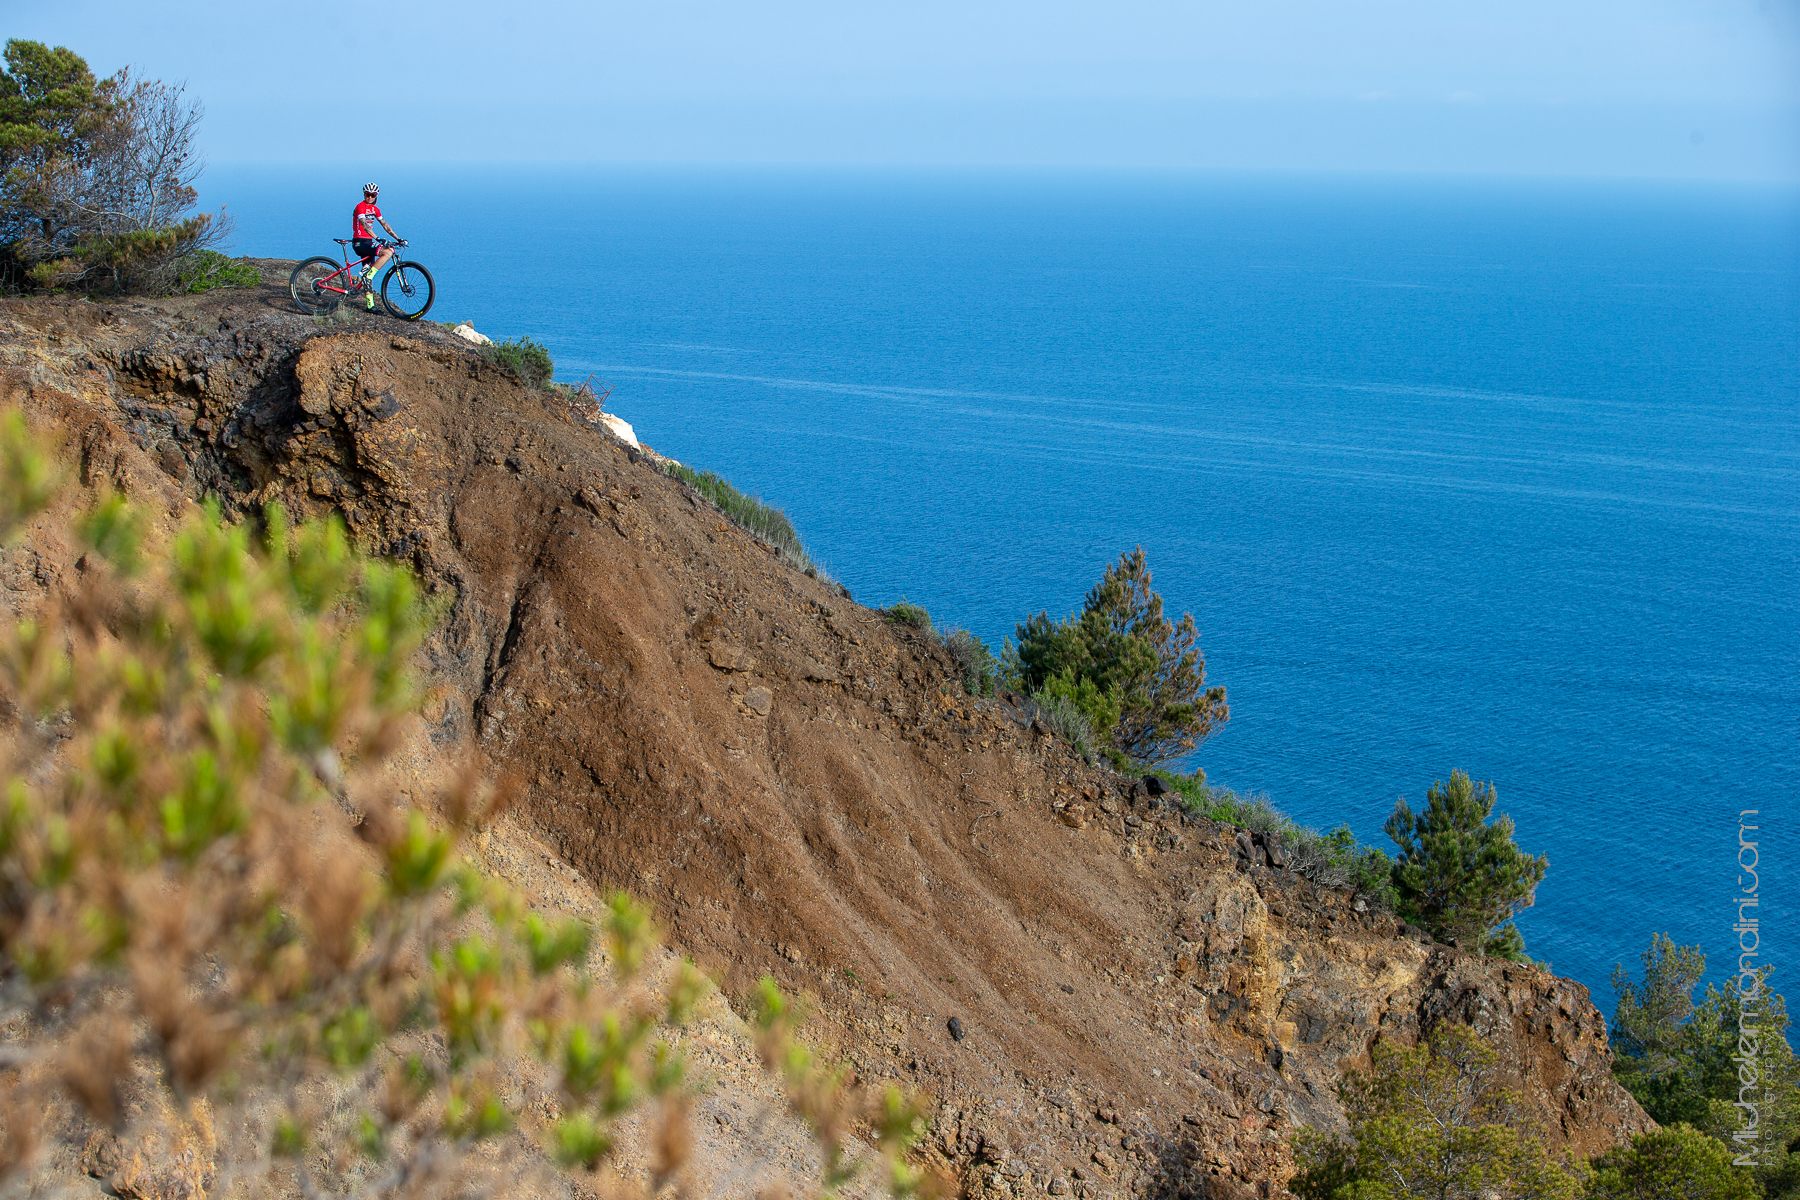 Shooting with Mara Fumagalli - Isola d'Elba - Ph: Michele Mondini